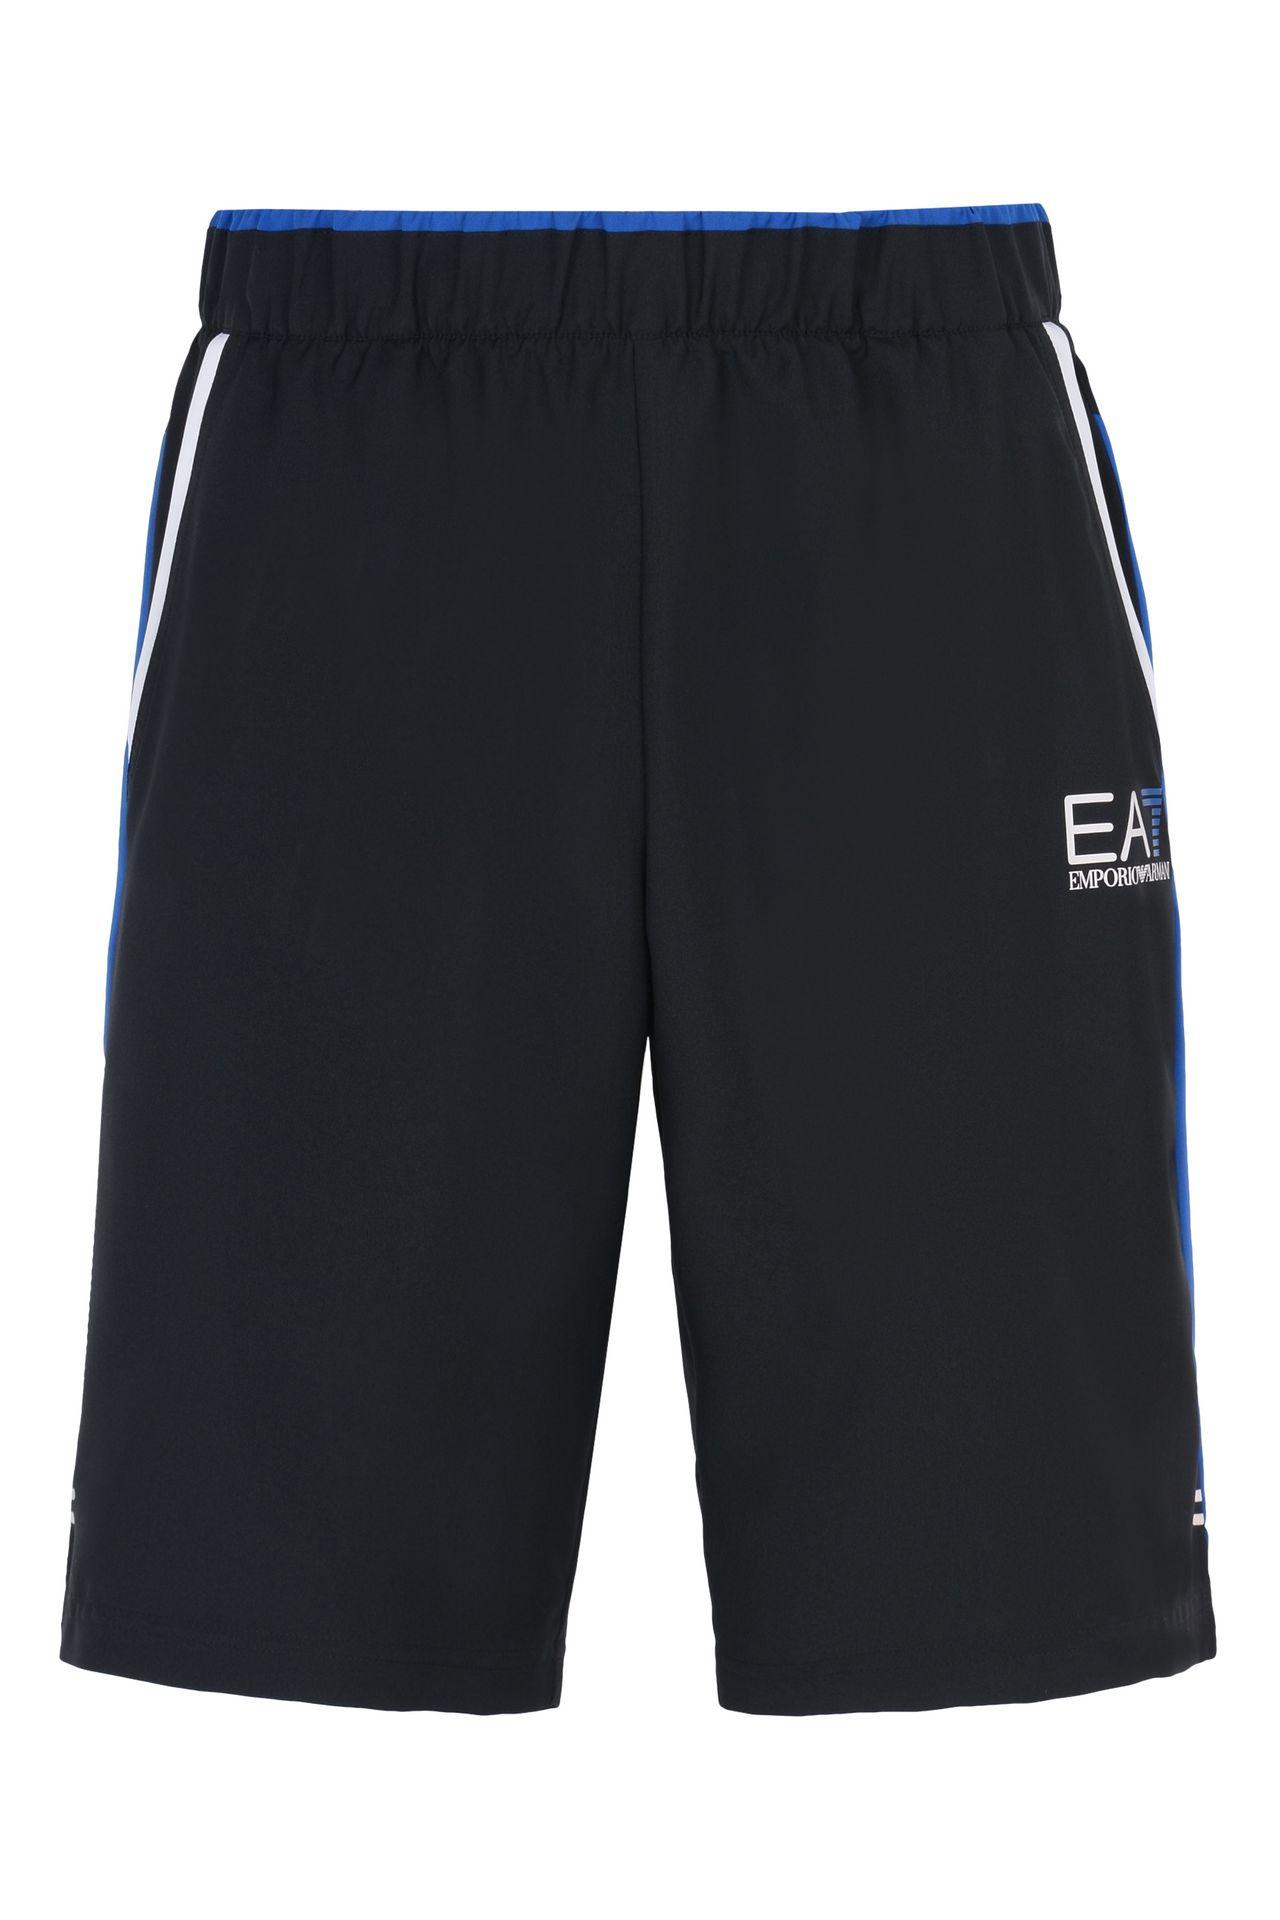 SHORTS IN TESSUTO TECNICO : Shorts Uomo by Armani - 0